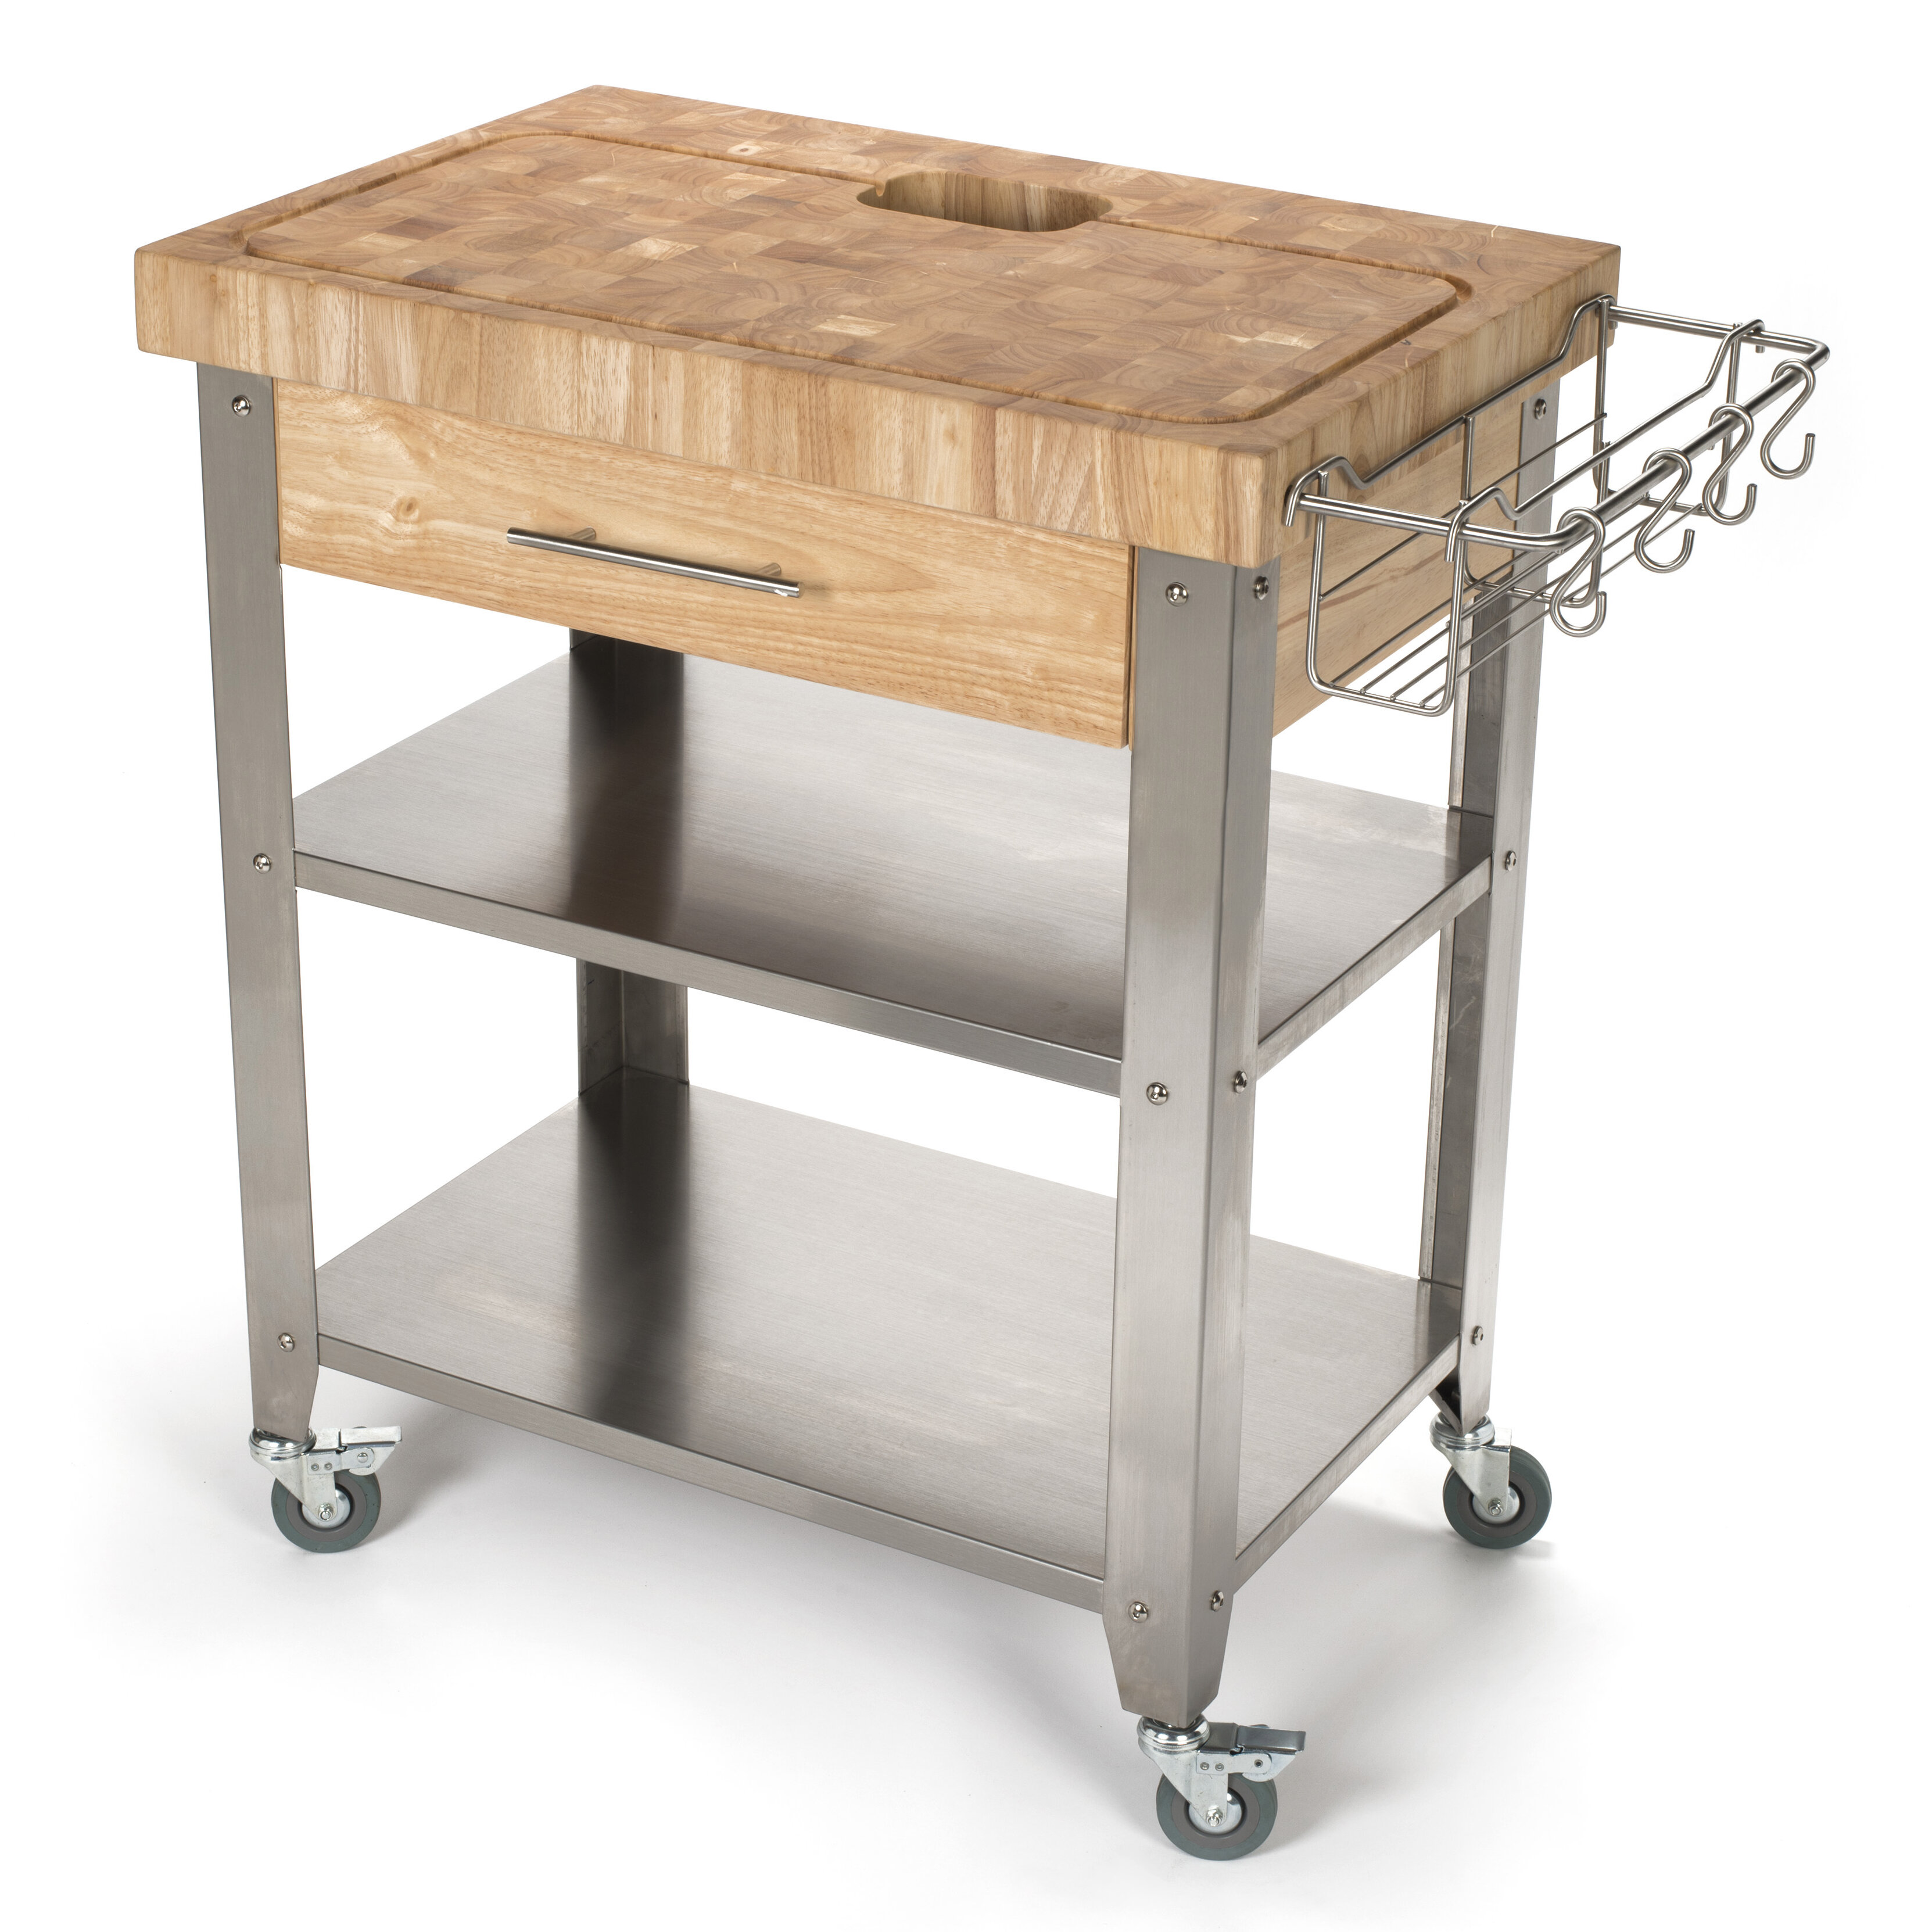 Chris & Chris Pro Stadium Kitchen Cart with Butcher Block Top ...